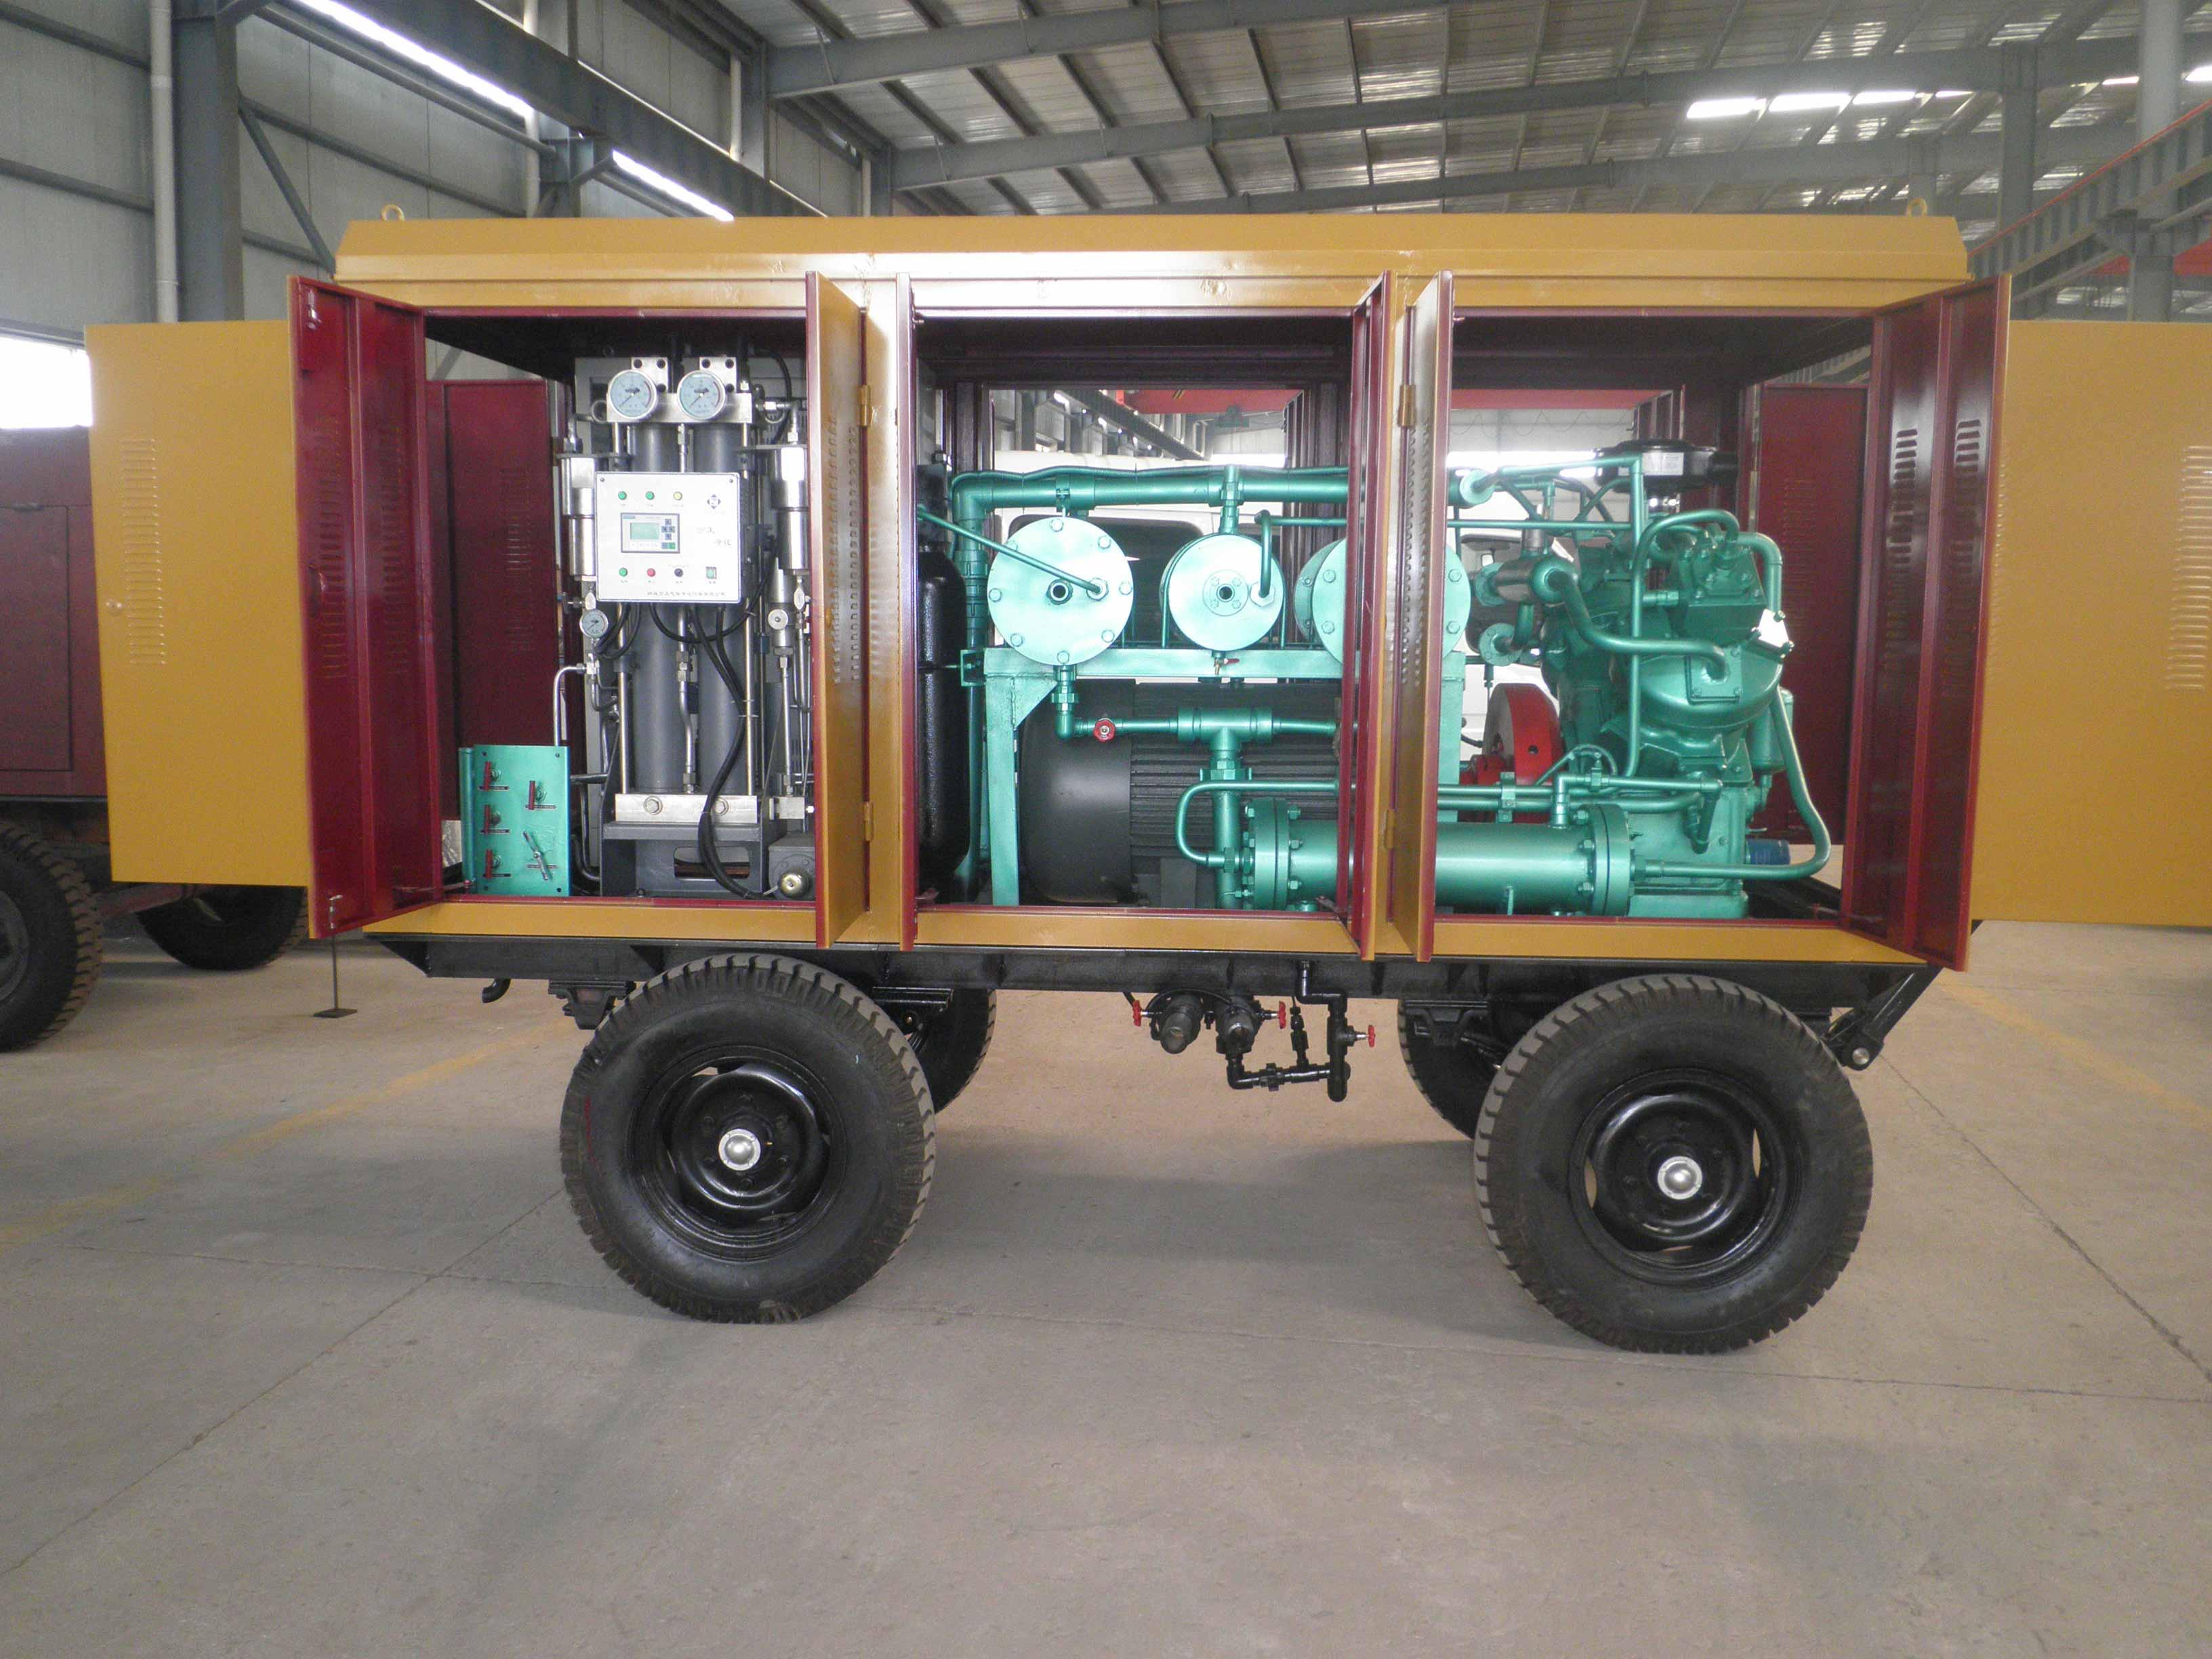 V-3立方-350公斤移动式无油空气压缩机系列(出口朝鲜)